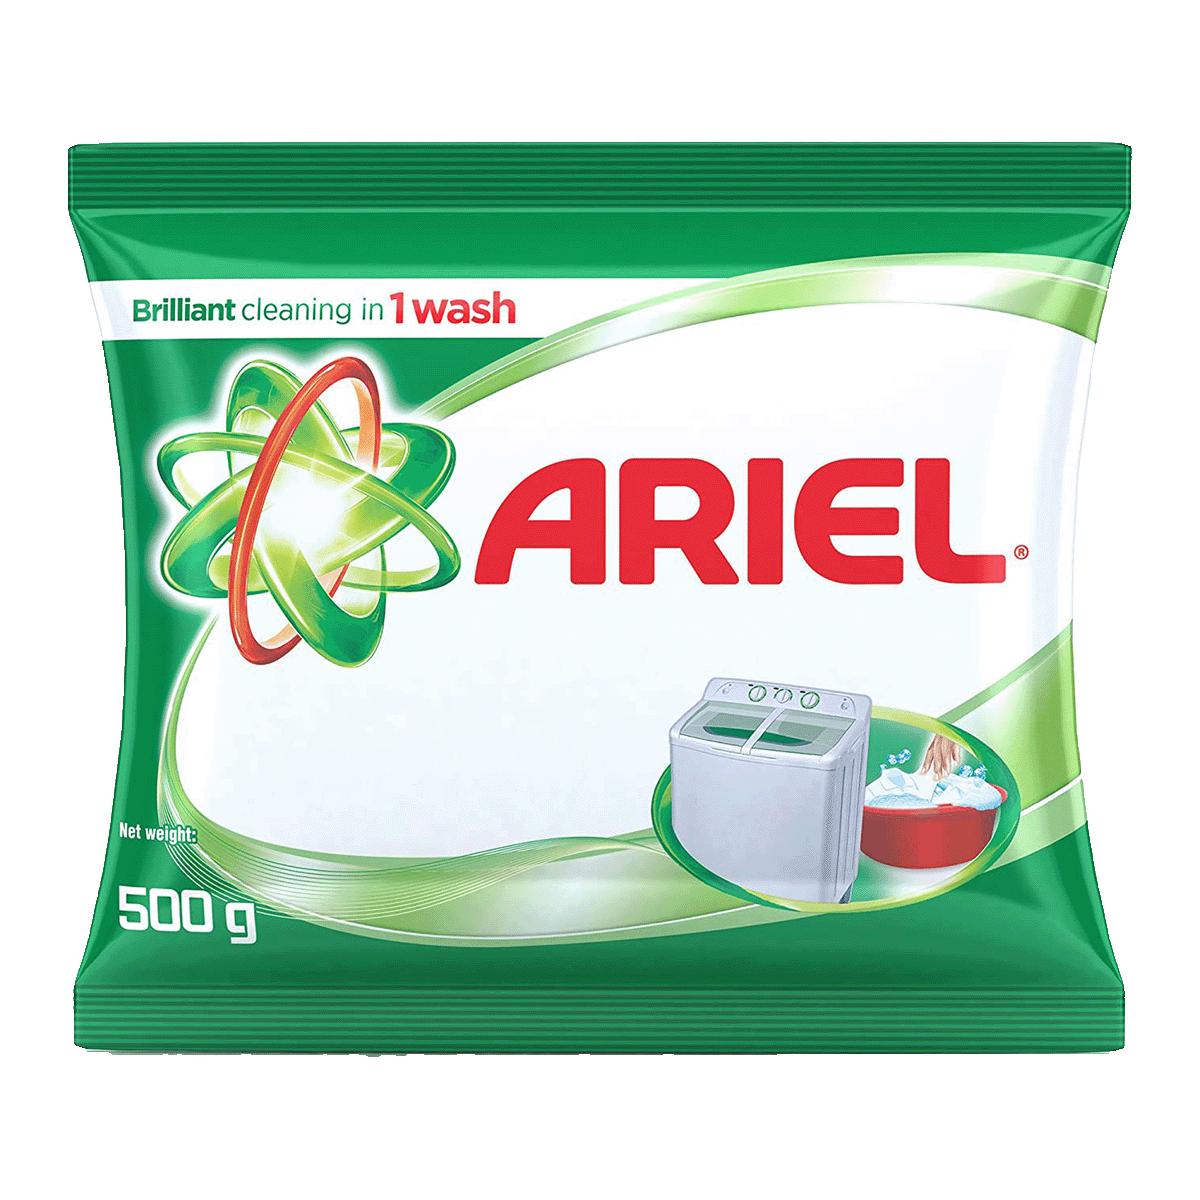 Ariel Matic Top Load 500gm detergent_1